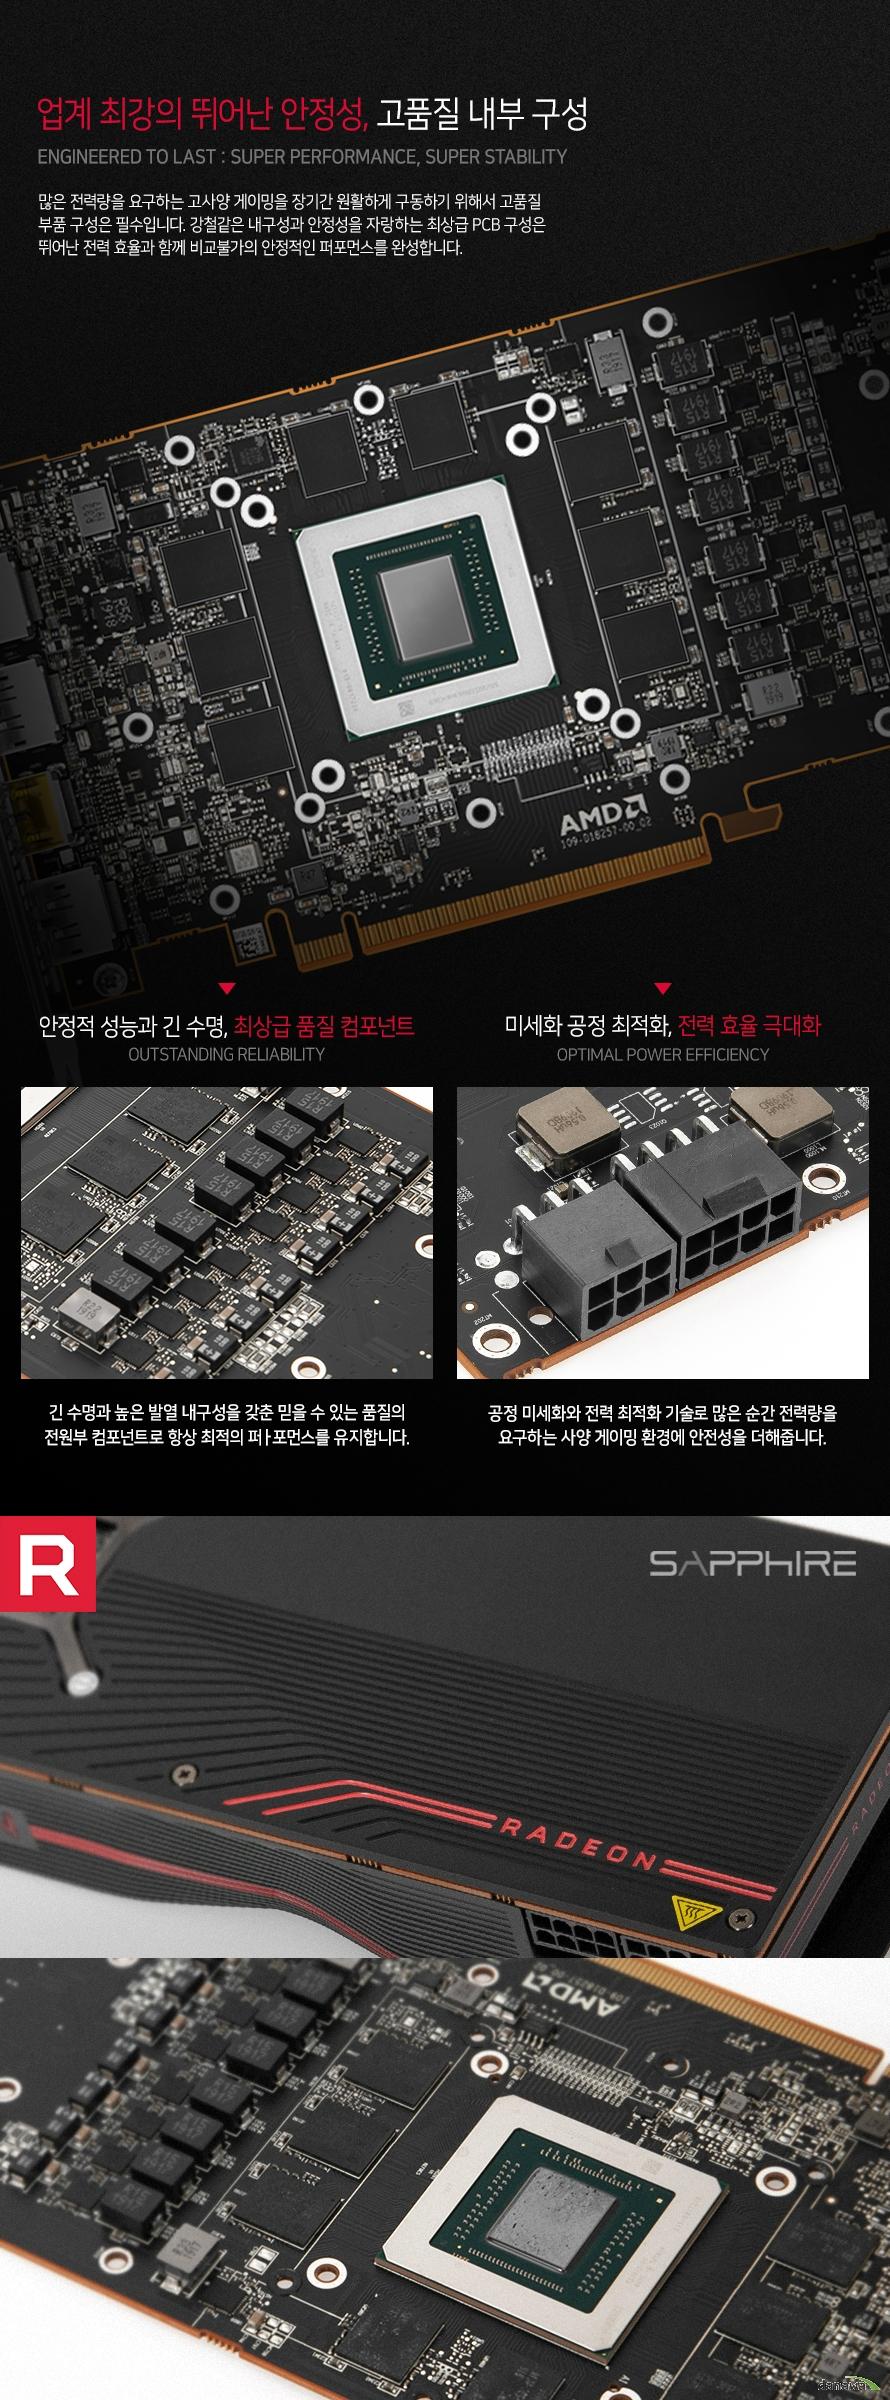 SAPPHIRE  라데온 RX 5700 XT D6 8GB